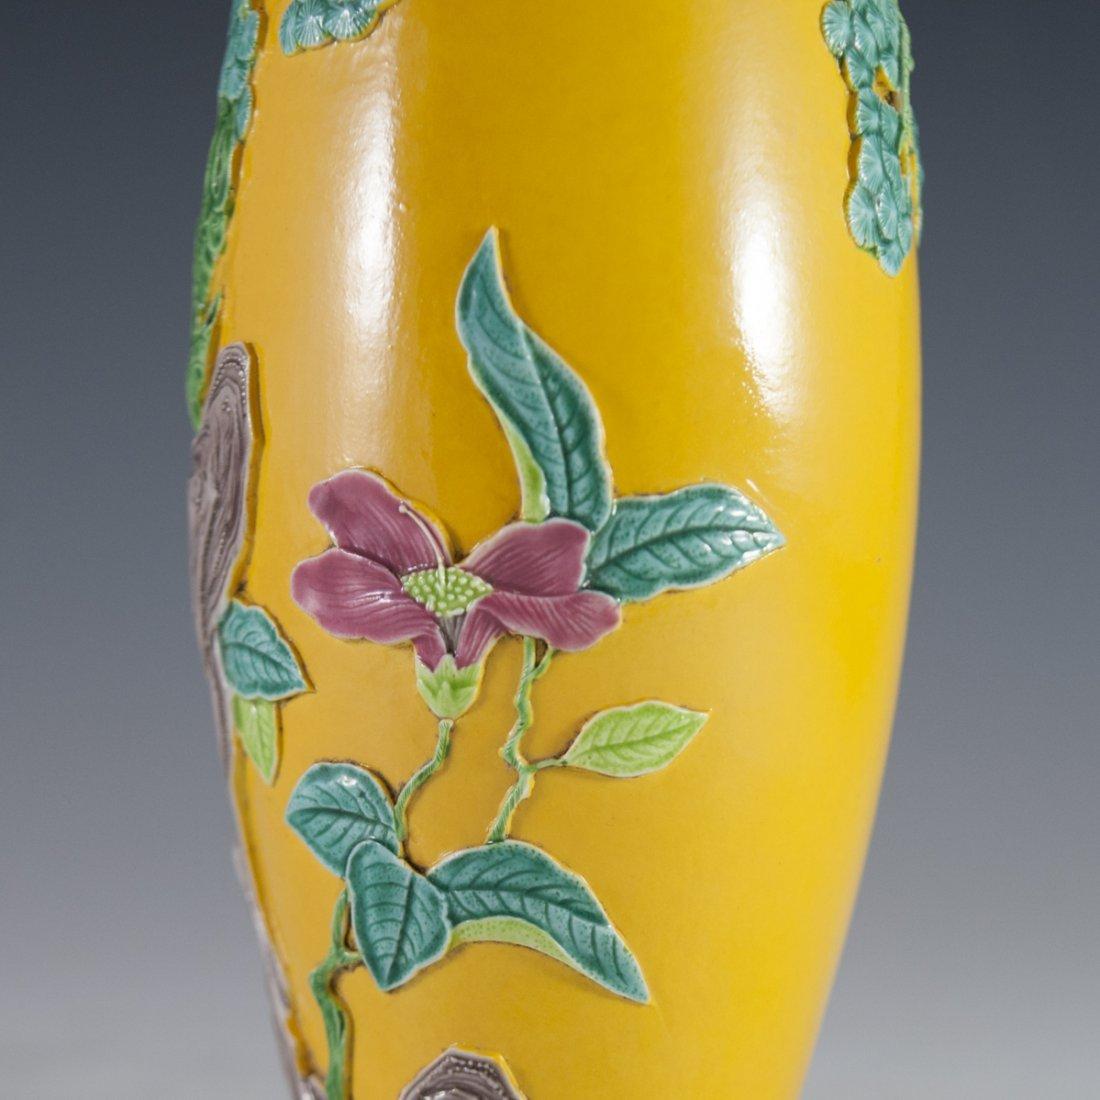 Antique Molded Chinese Porcelain Vase - 5